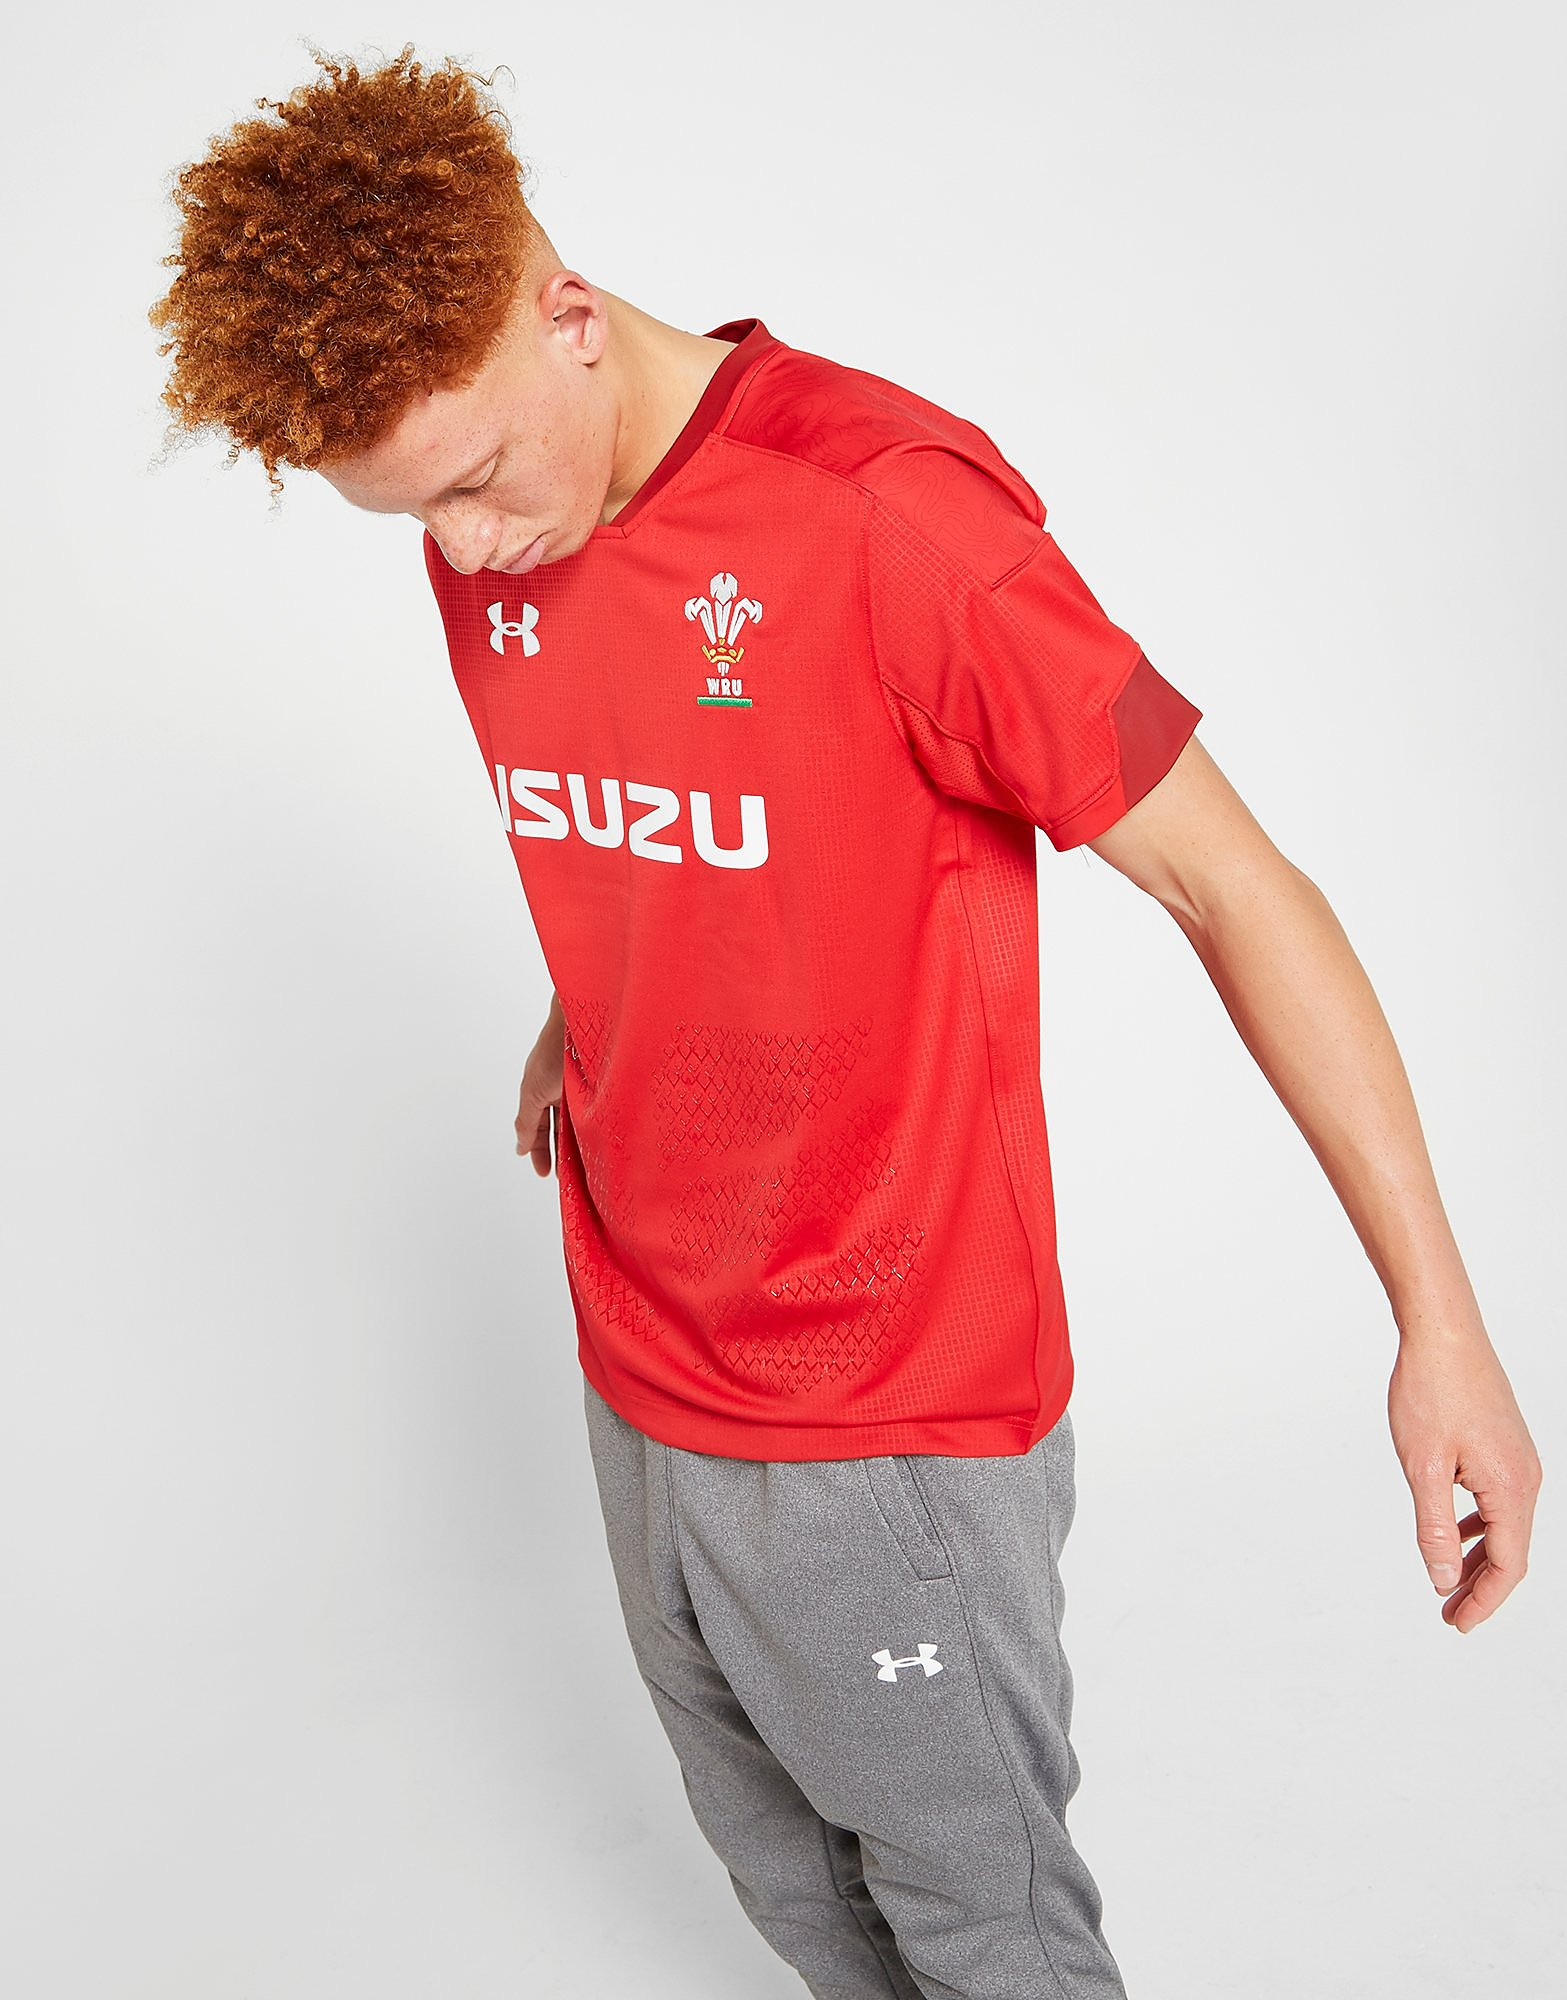 Under Armour Wales RU 2017/18 Home Shirt